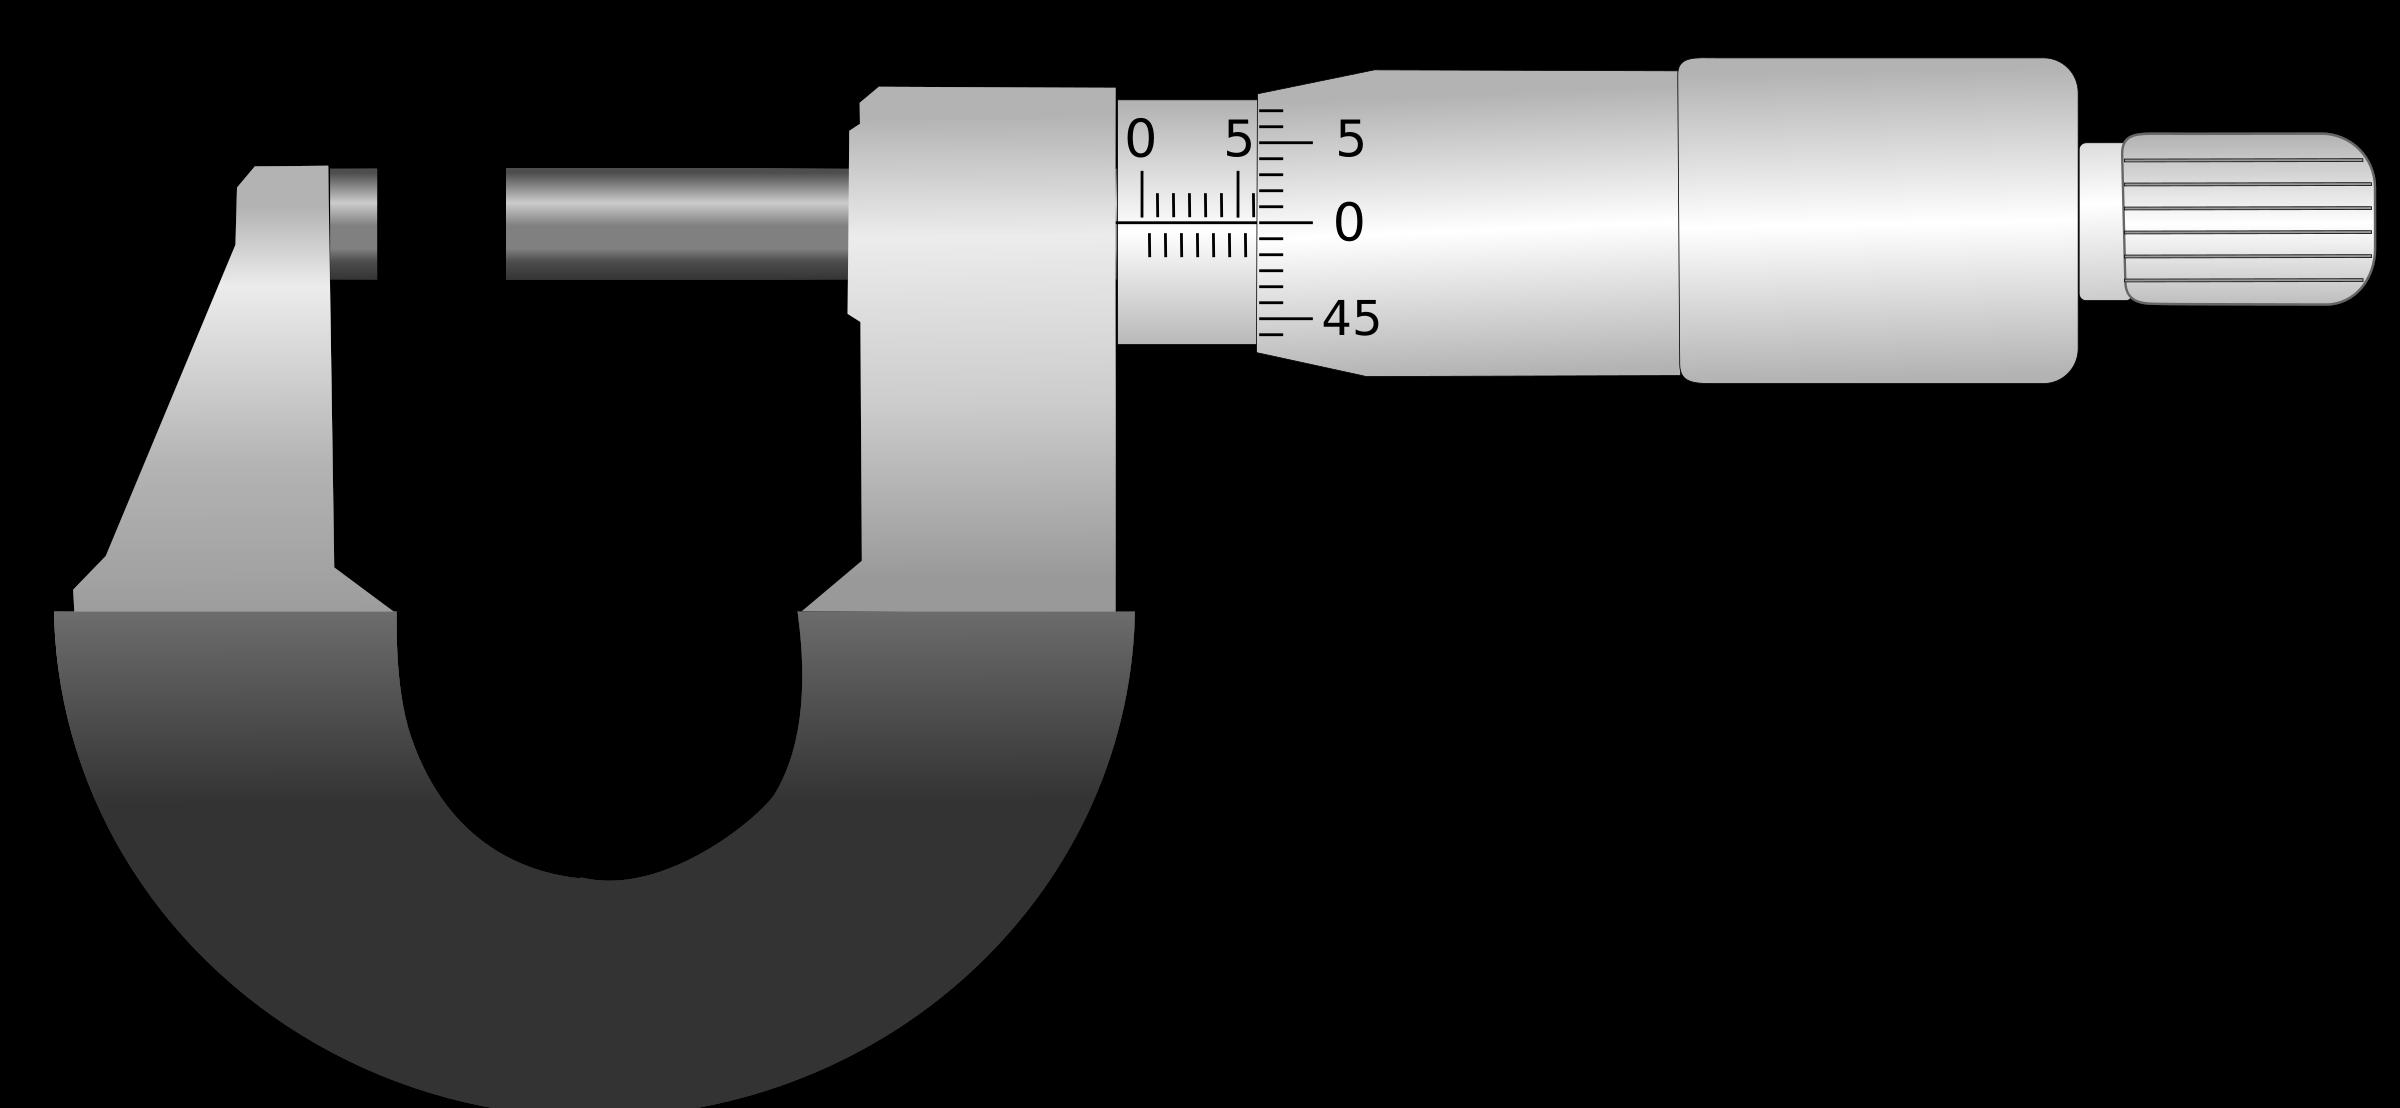 Clipart - Micrometer